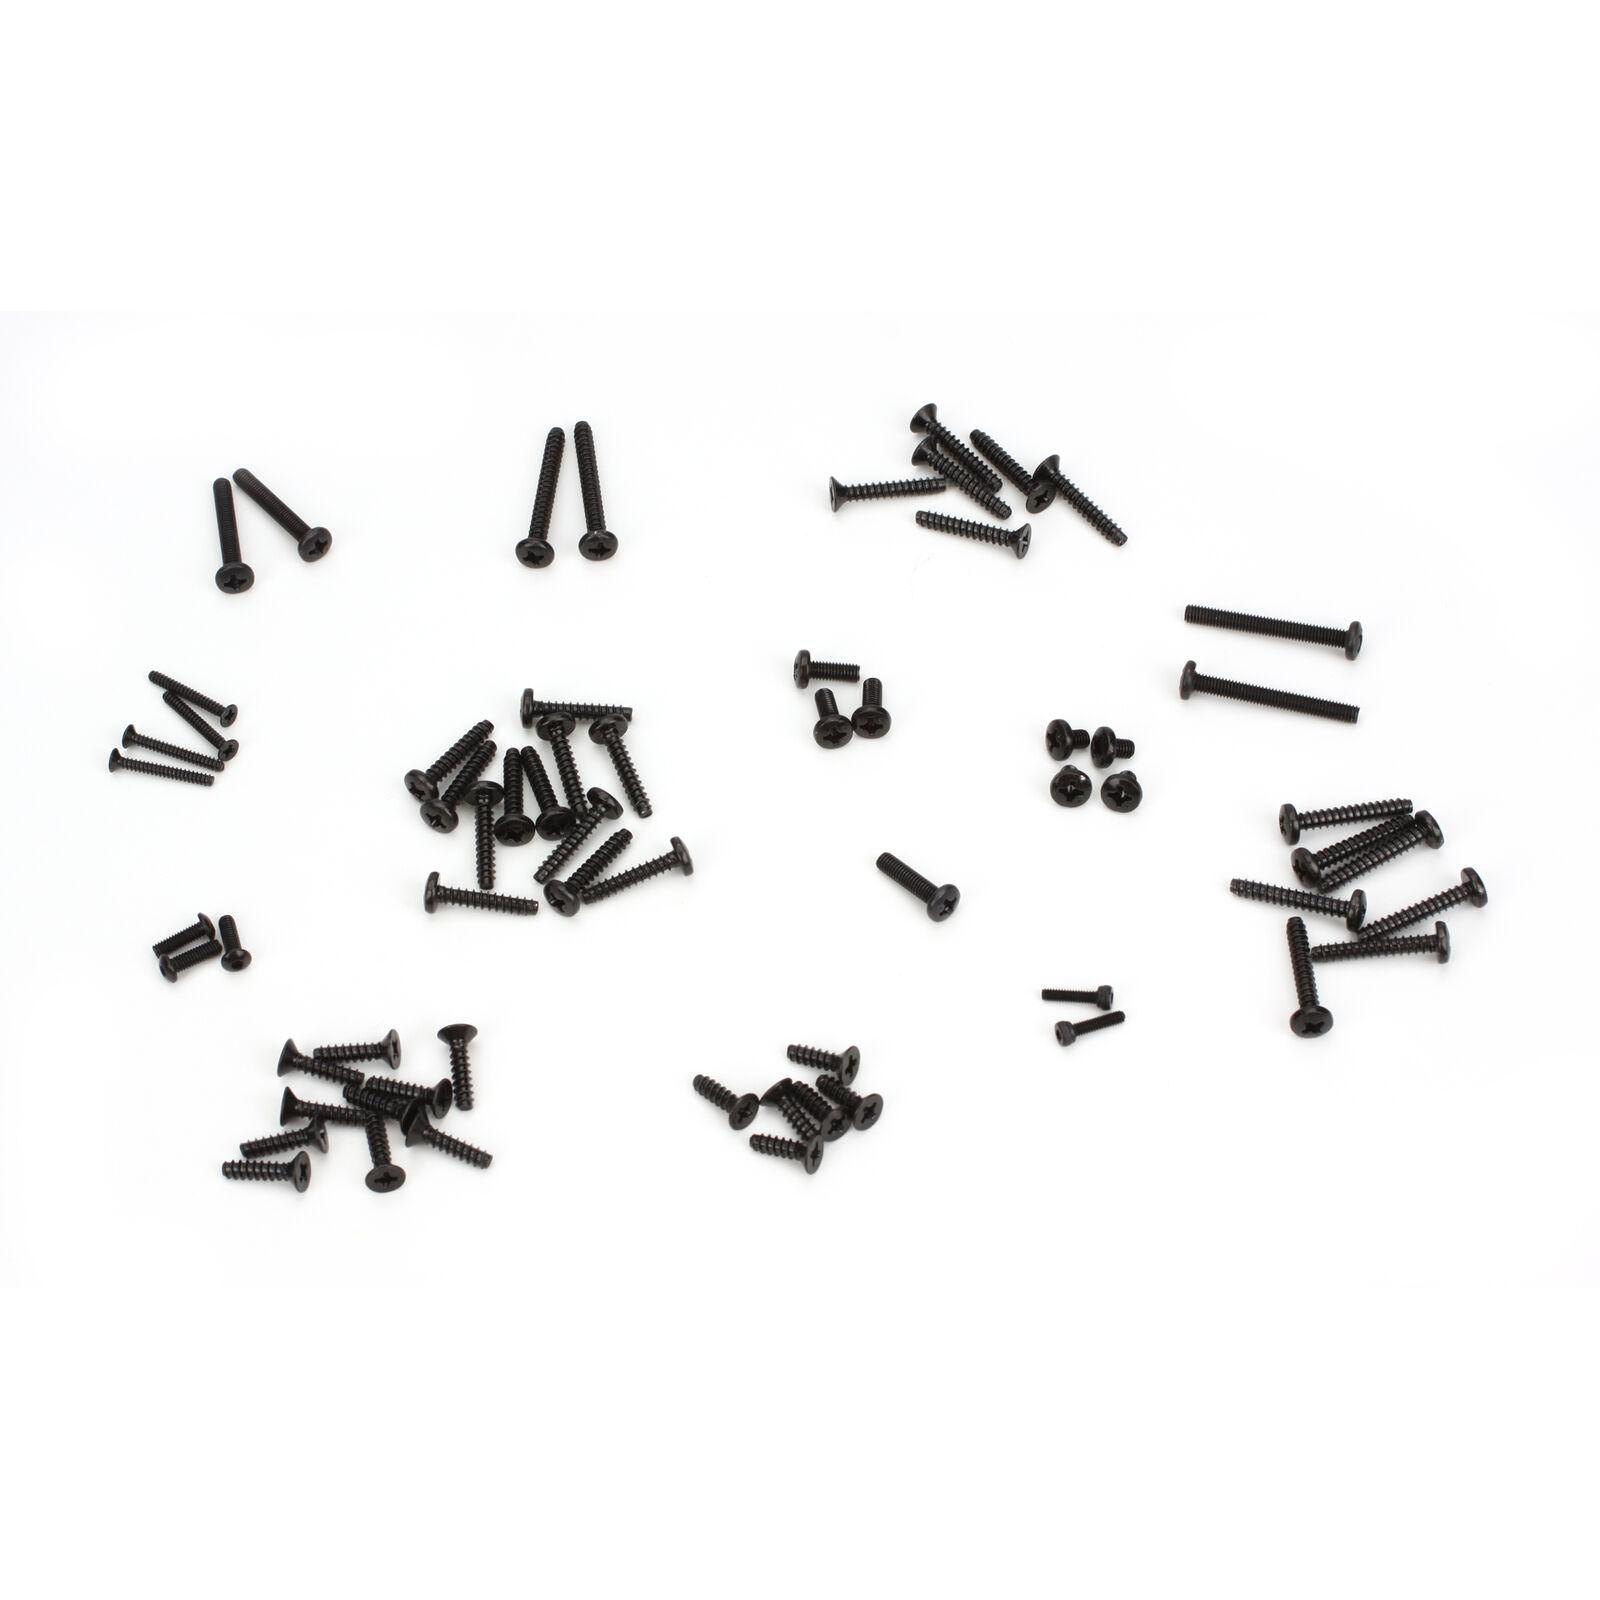 Screw Set (64): All ECX 1/10 2WD